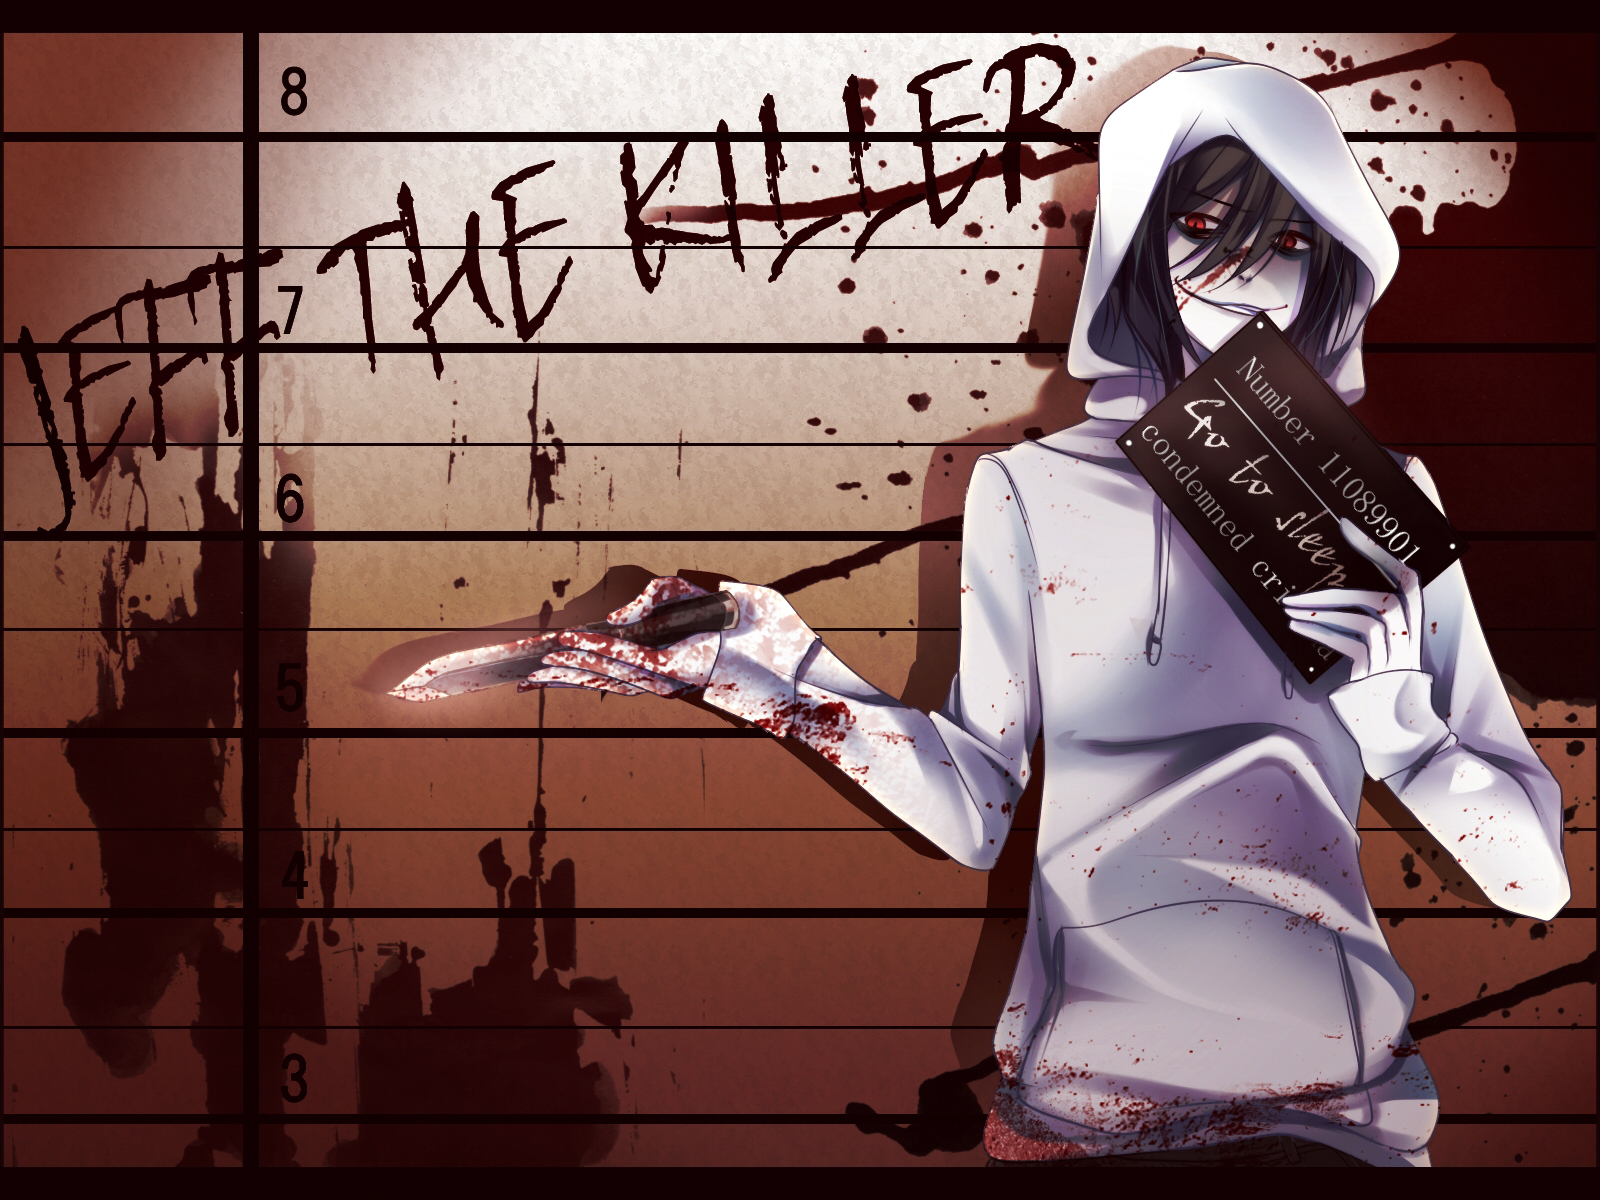 jeff the killer anime deutsch